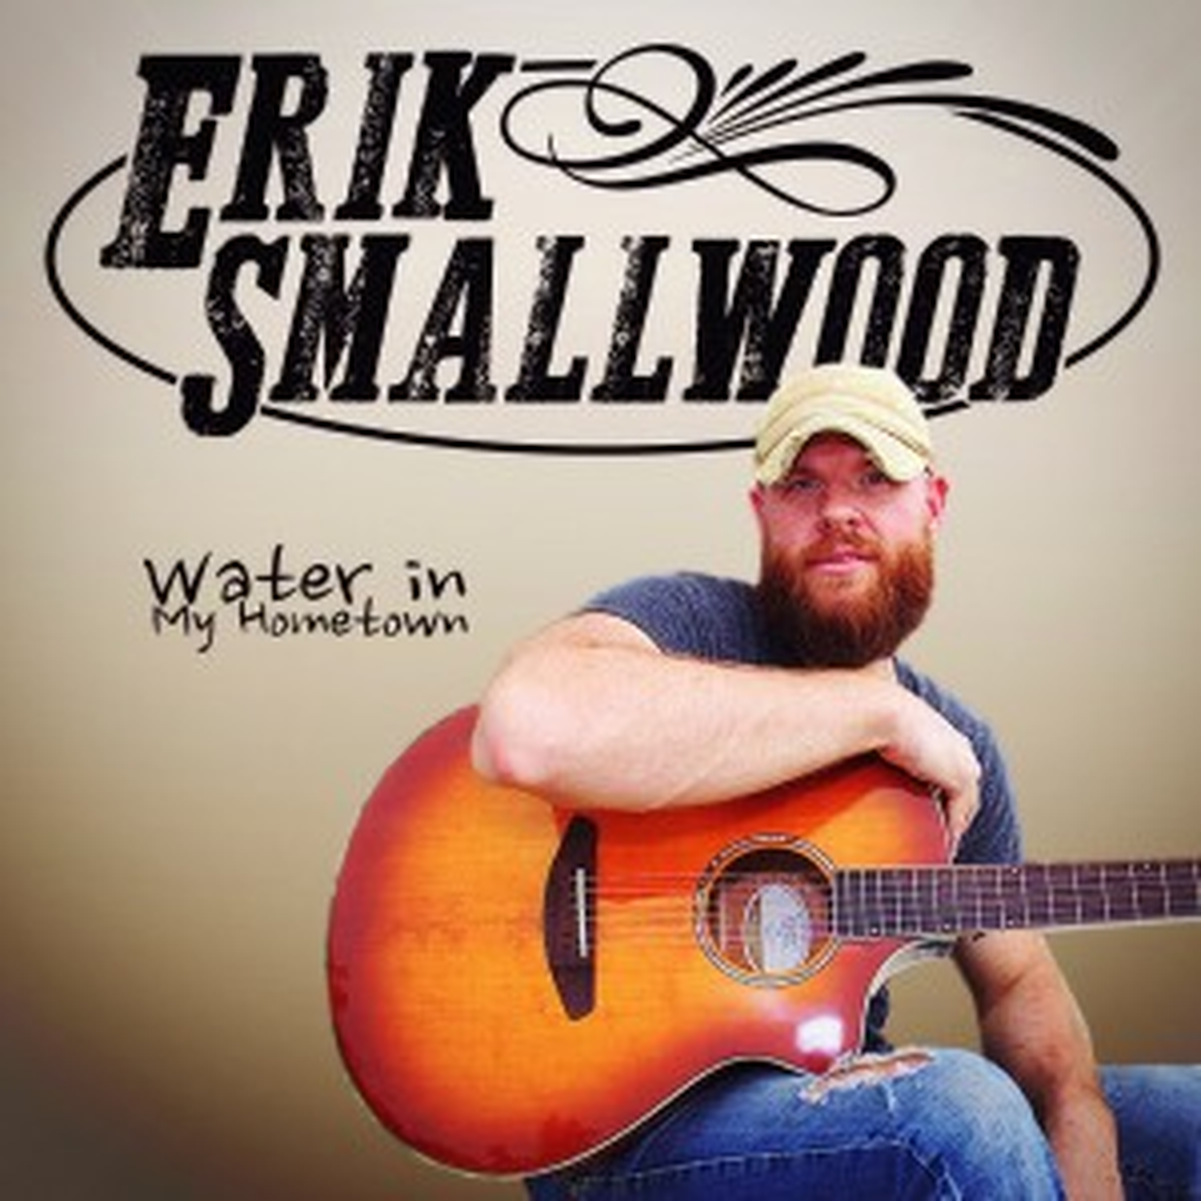 Erik Smallwood wiki, Erik Smallwood review, Erik Smallwood history, Erik Smallwood news